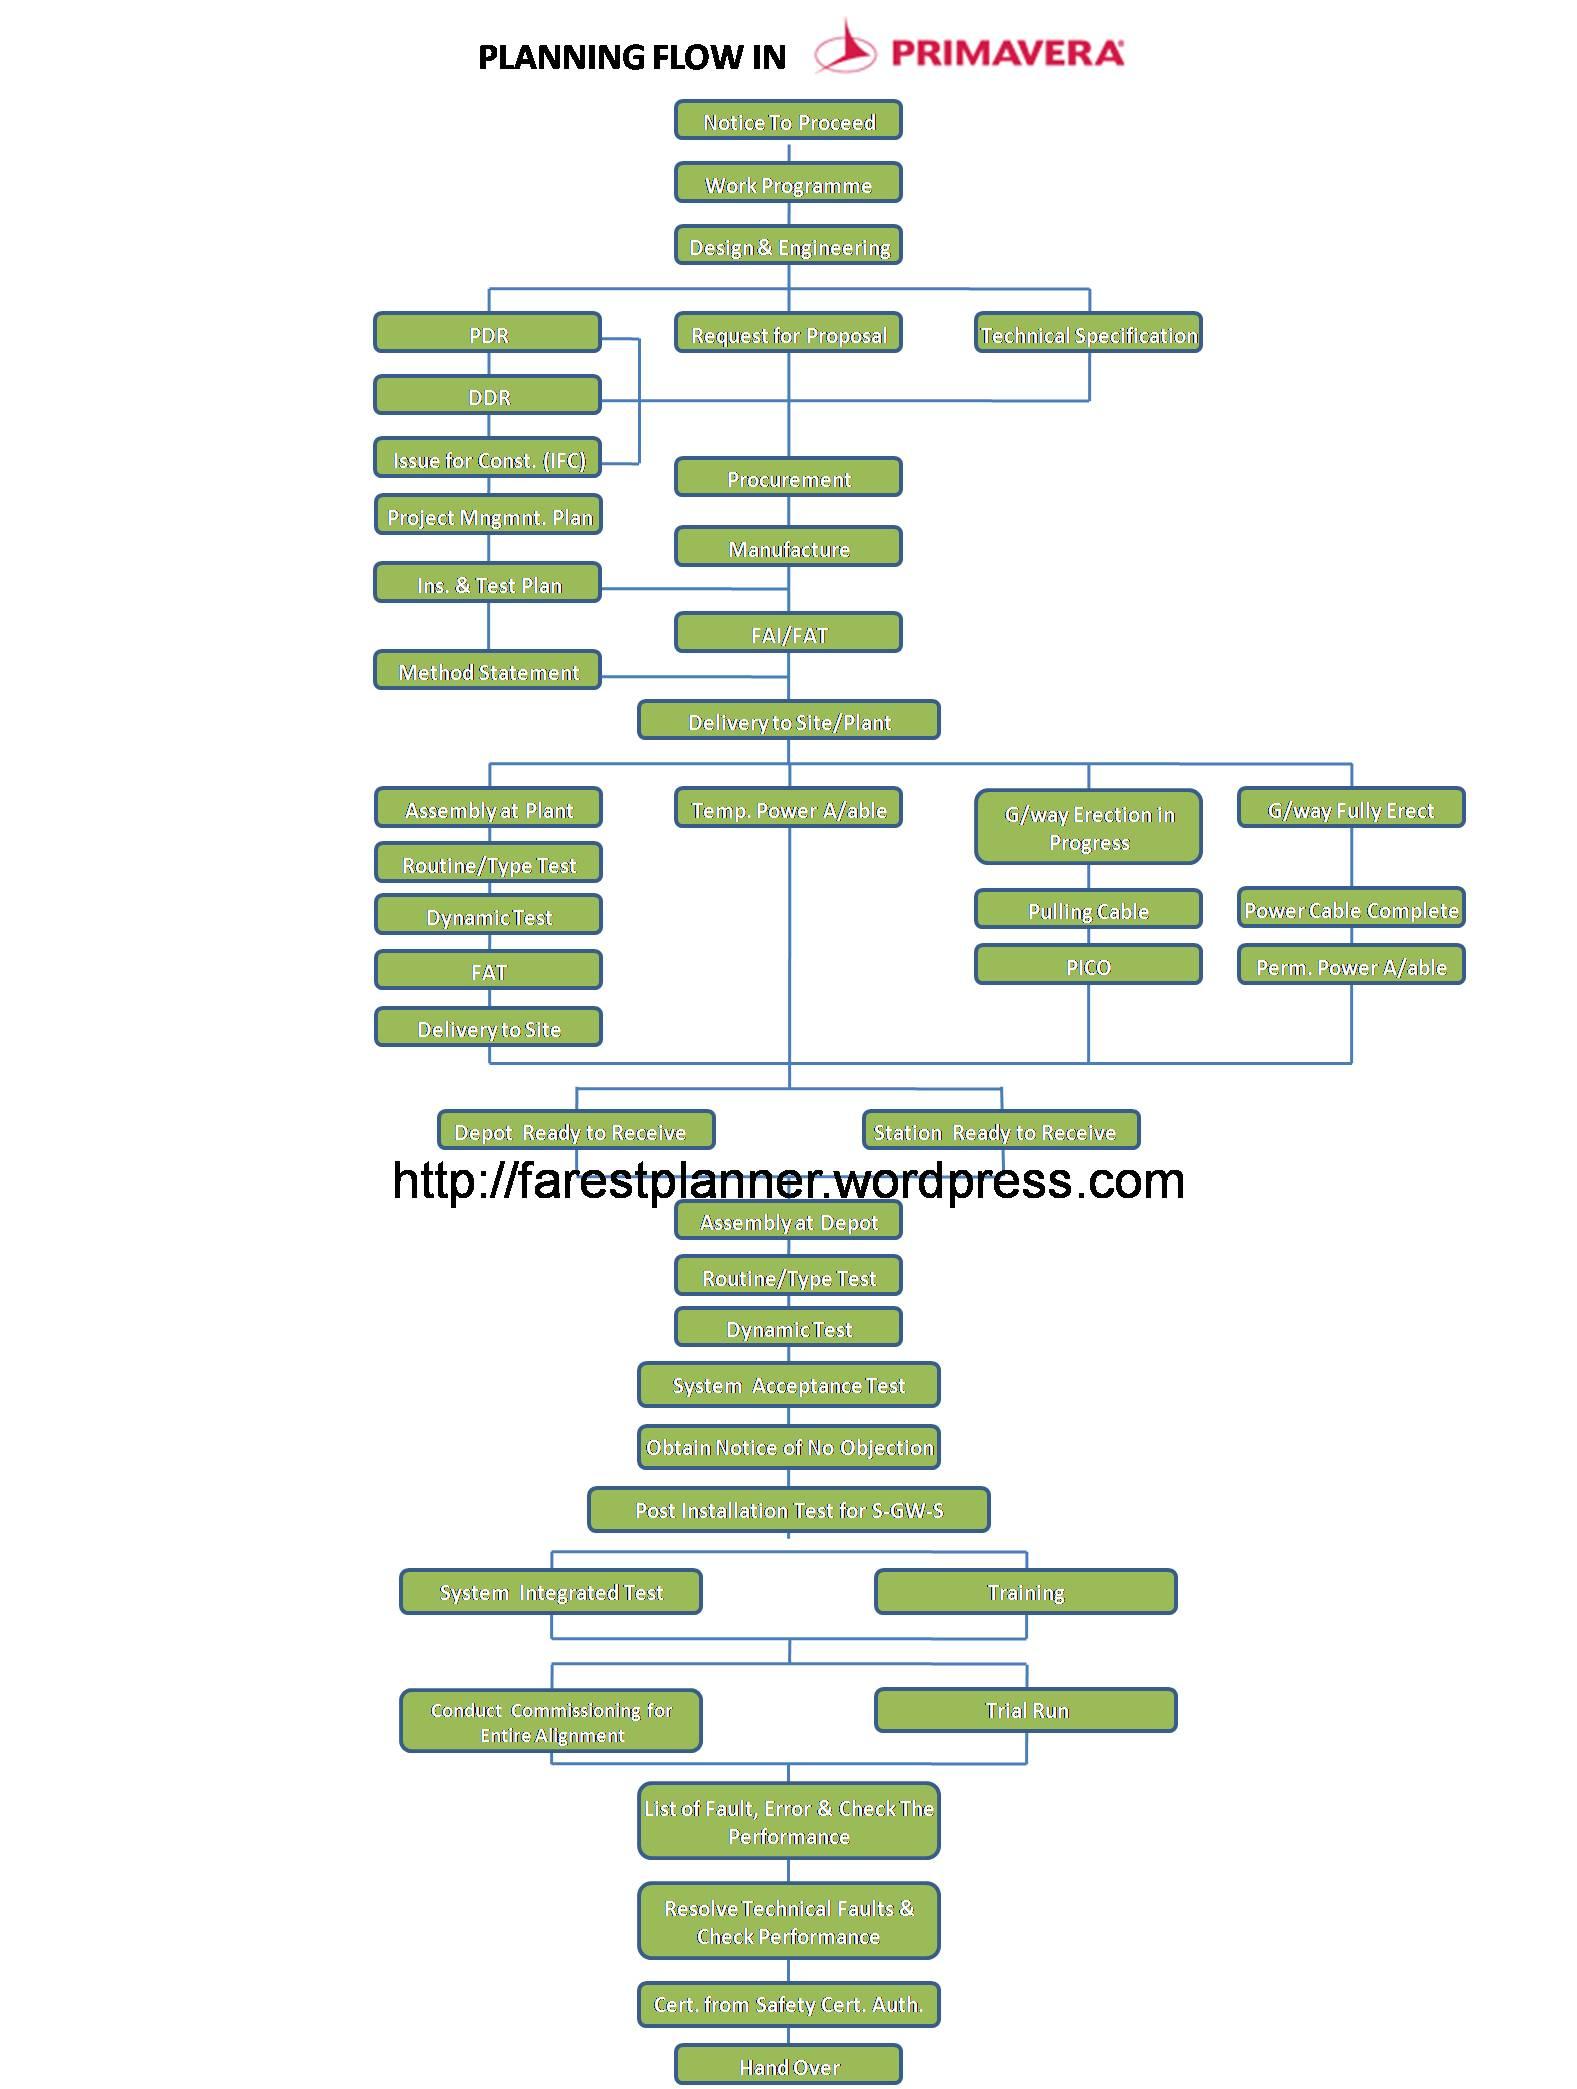 primavera project planner tutorial